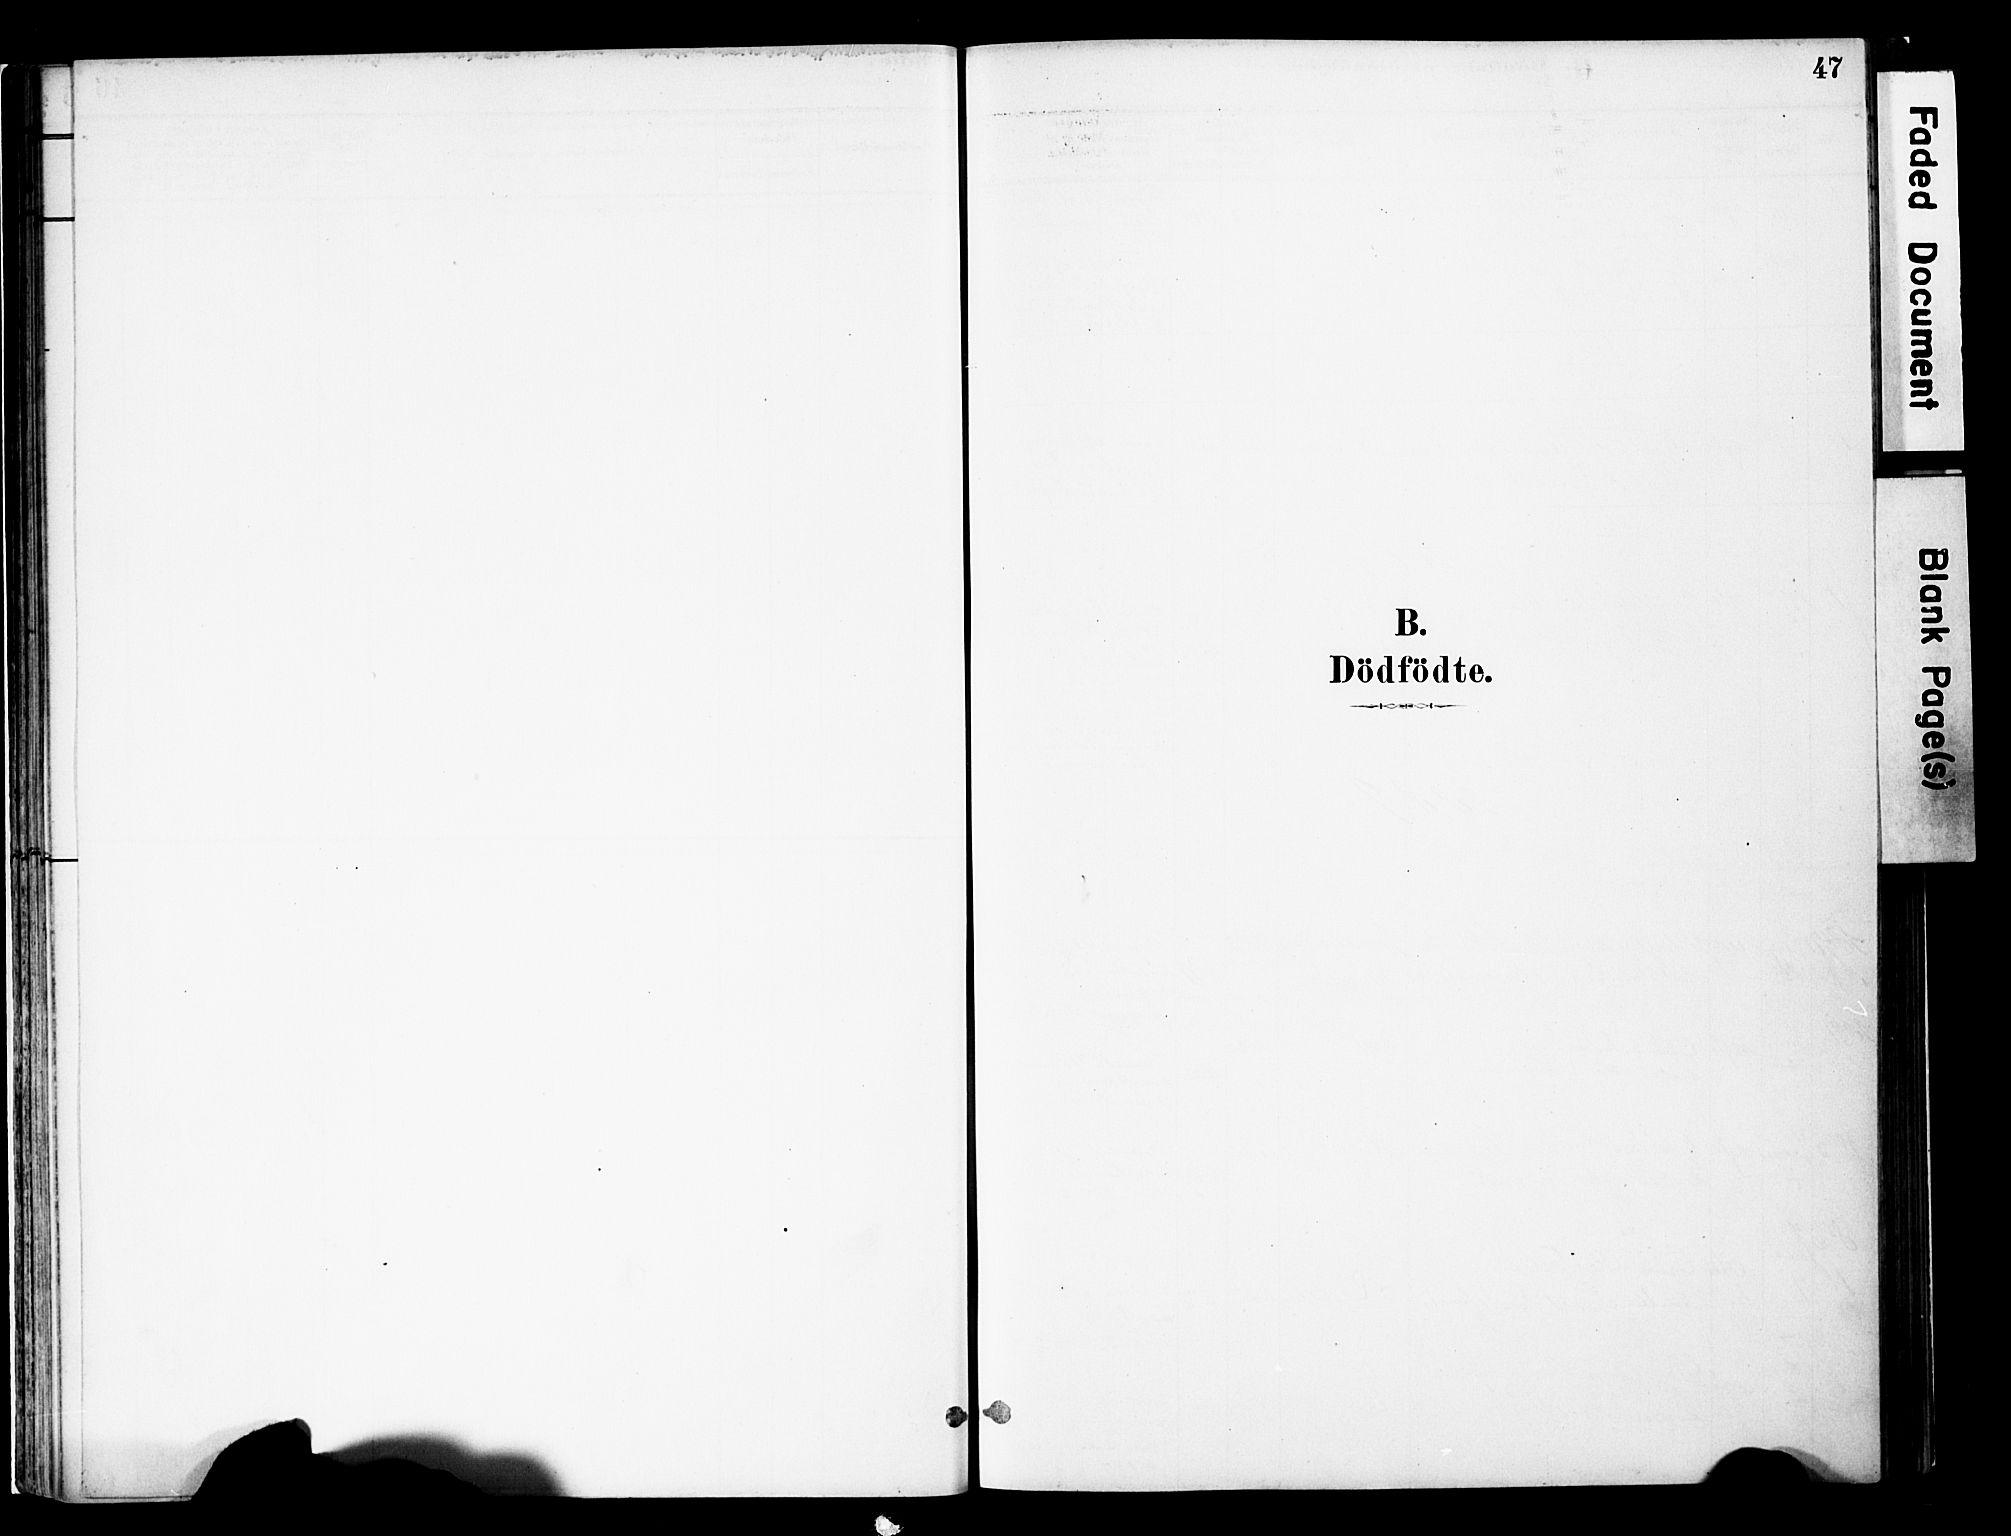 SAH, Vestre Slidre prestekontor, Ministerialbok nr. 5, 1881-1912, s. 47